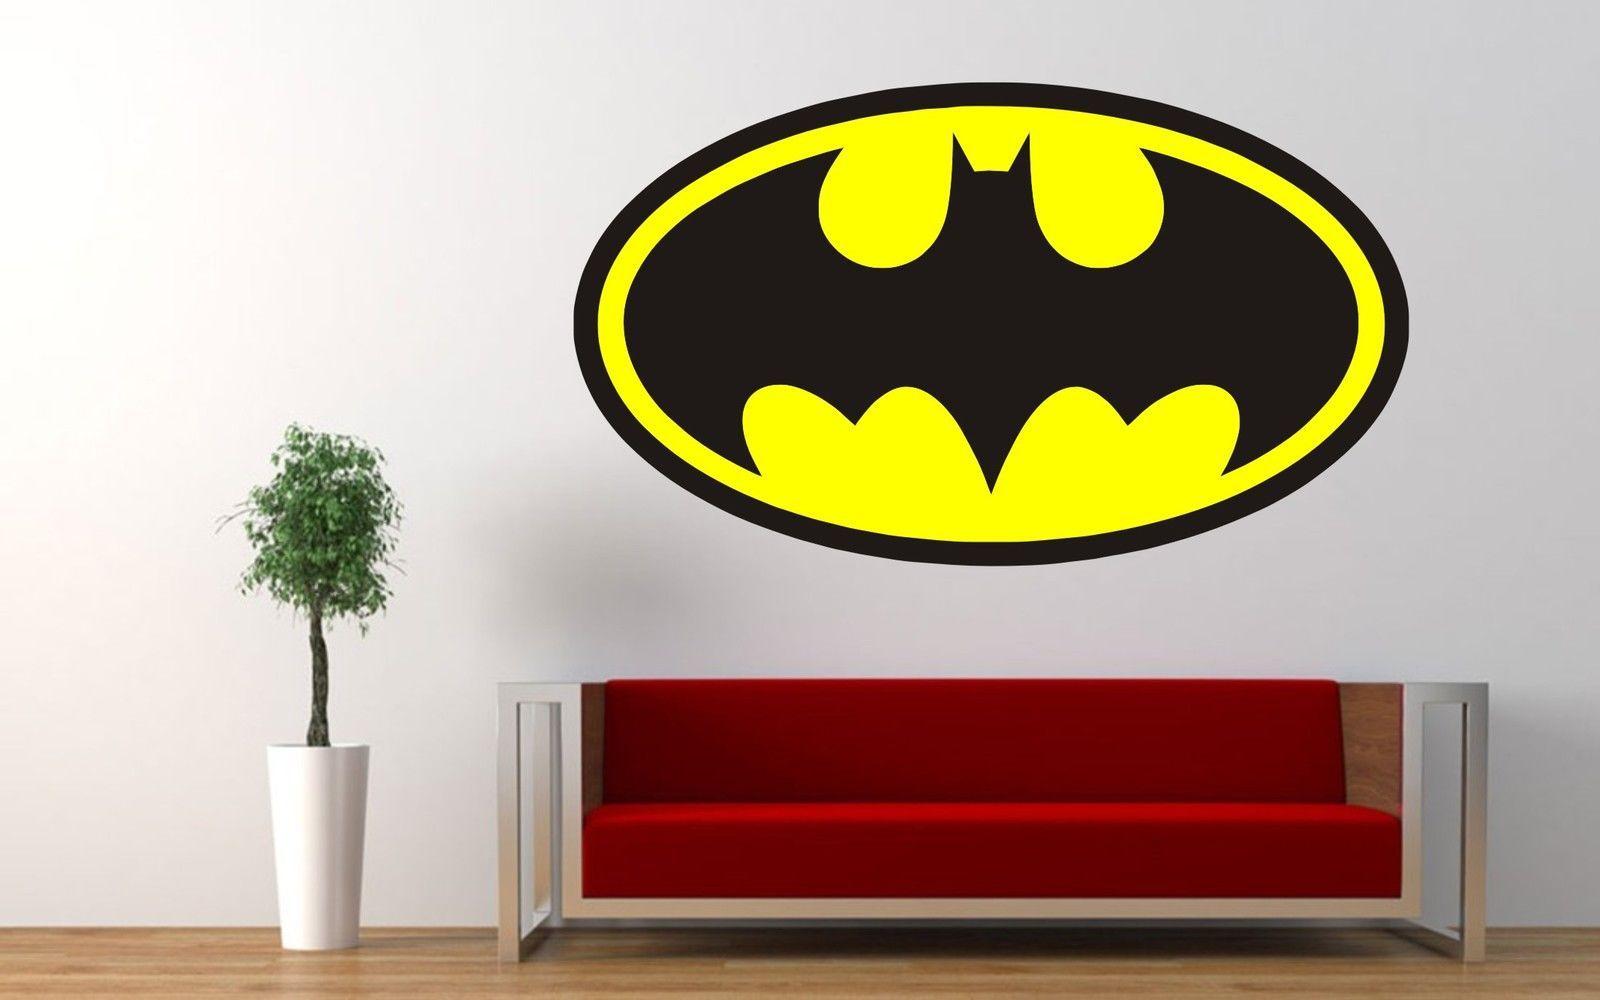 Graphy Bedroom Batman Logo Colour Superhero Wall Car Sticker Decal Art Retro